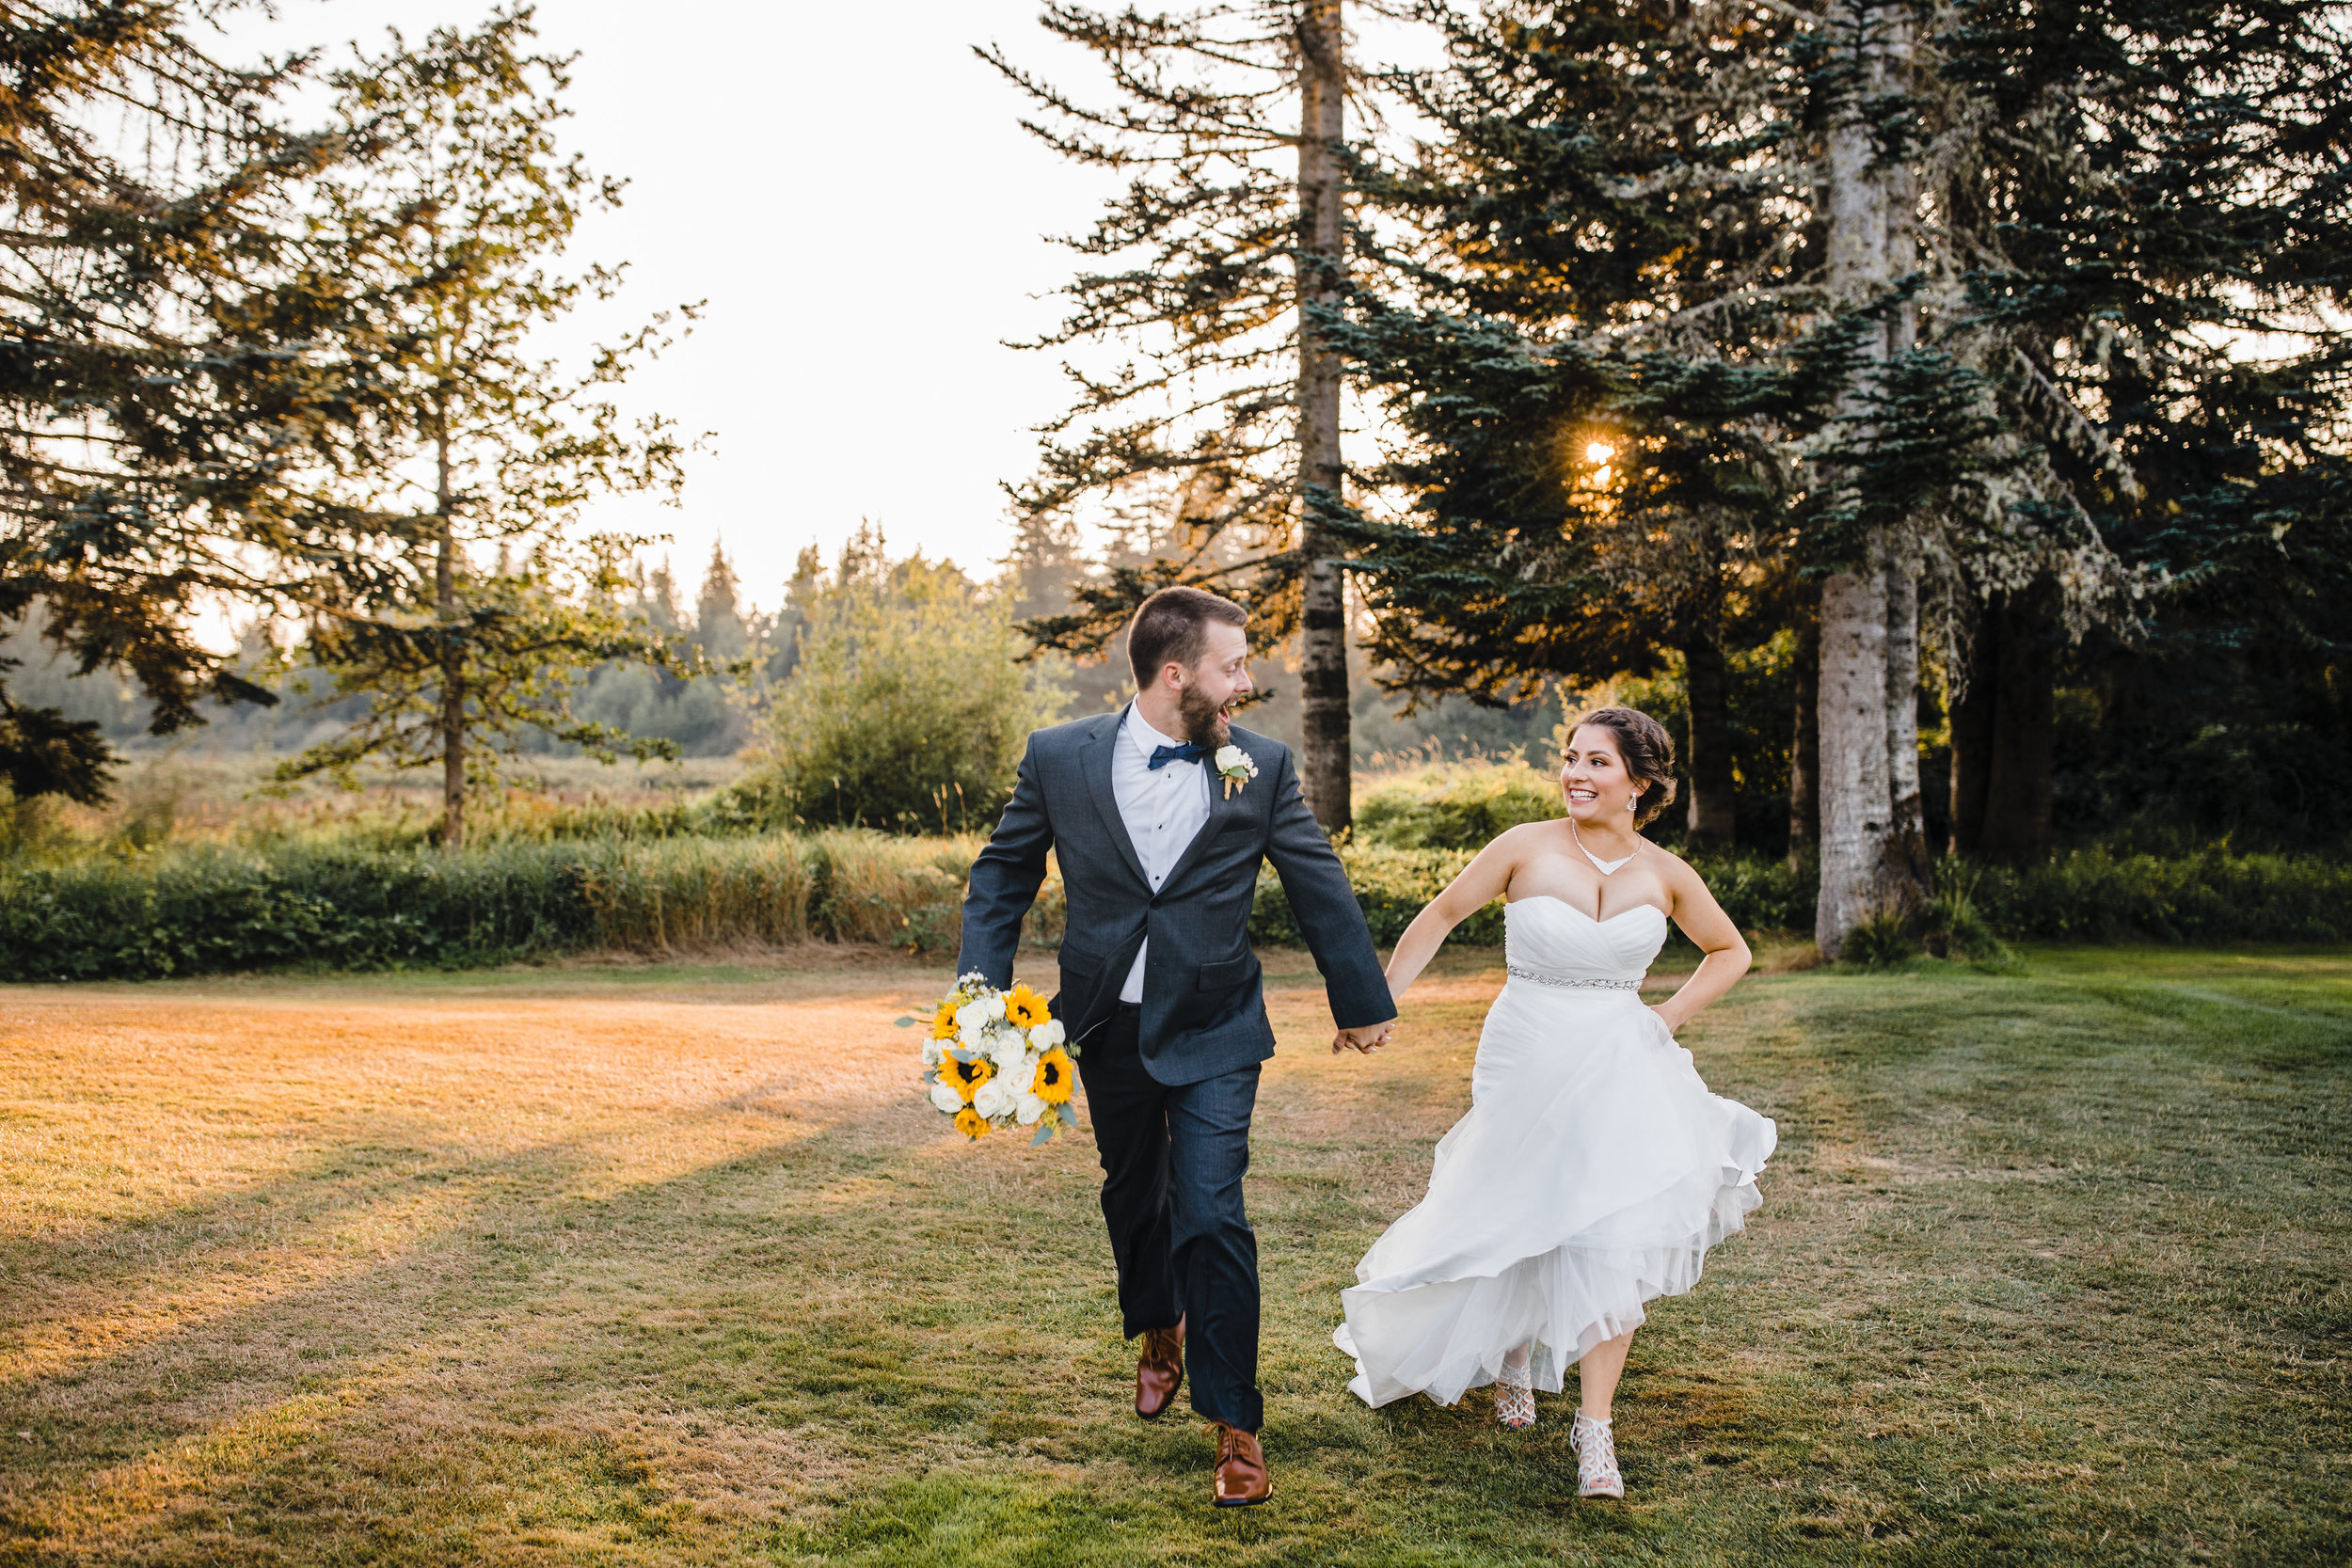 olympia washington professional wedding photographer running holding hands happy